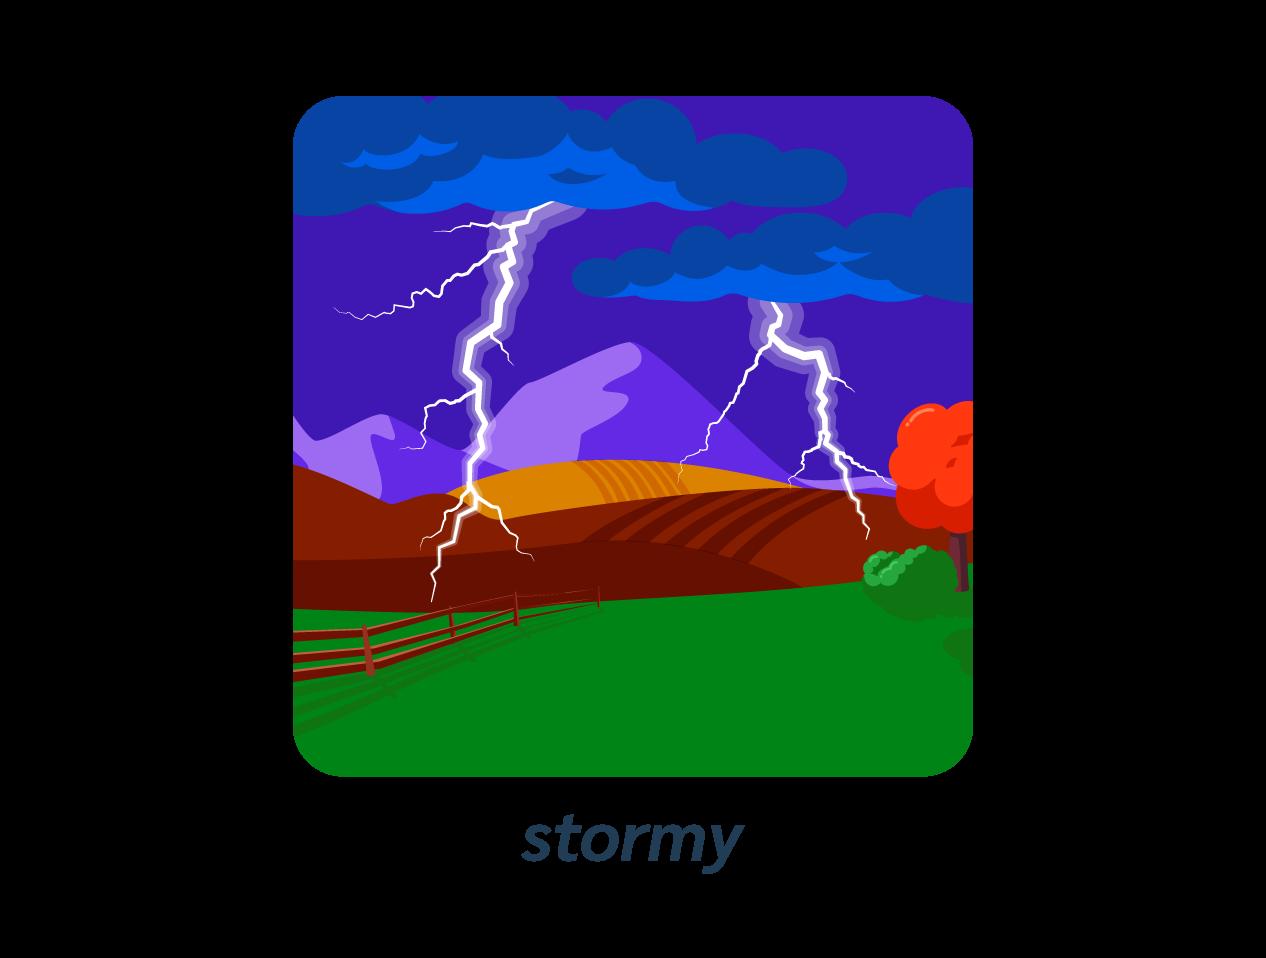 stormy orage anglais météo weather